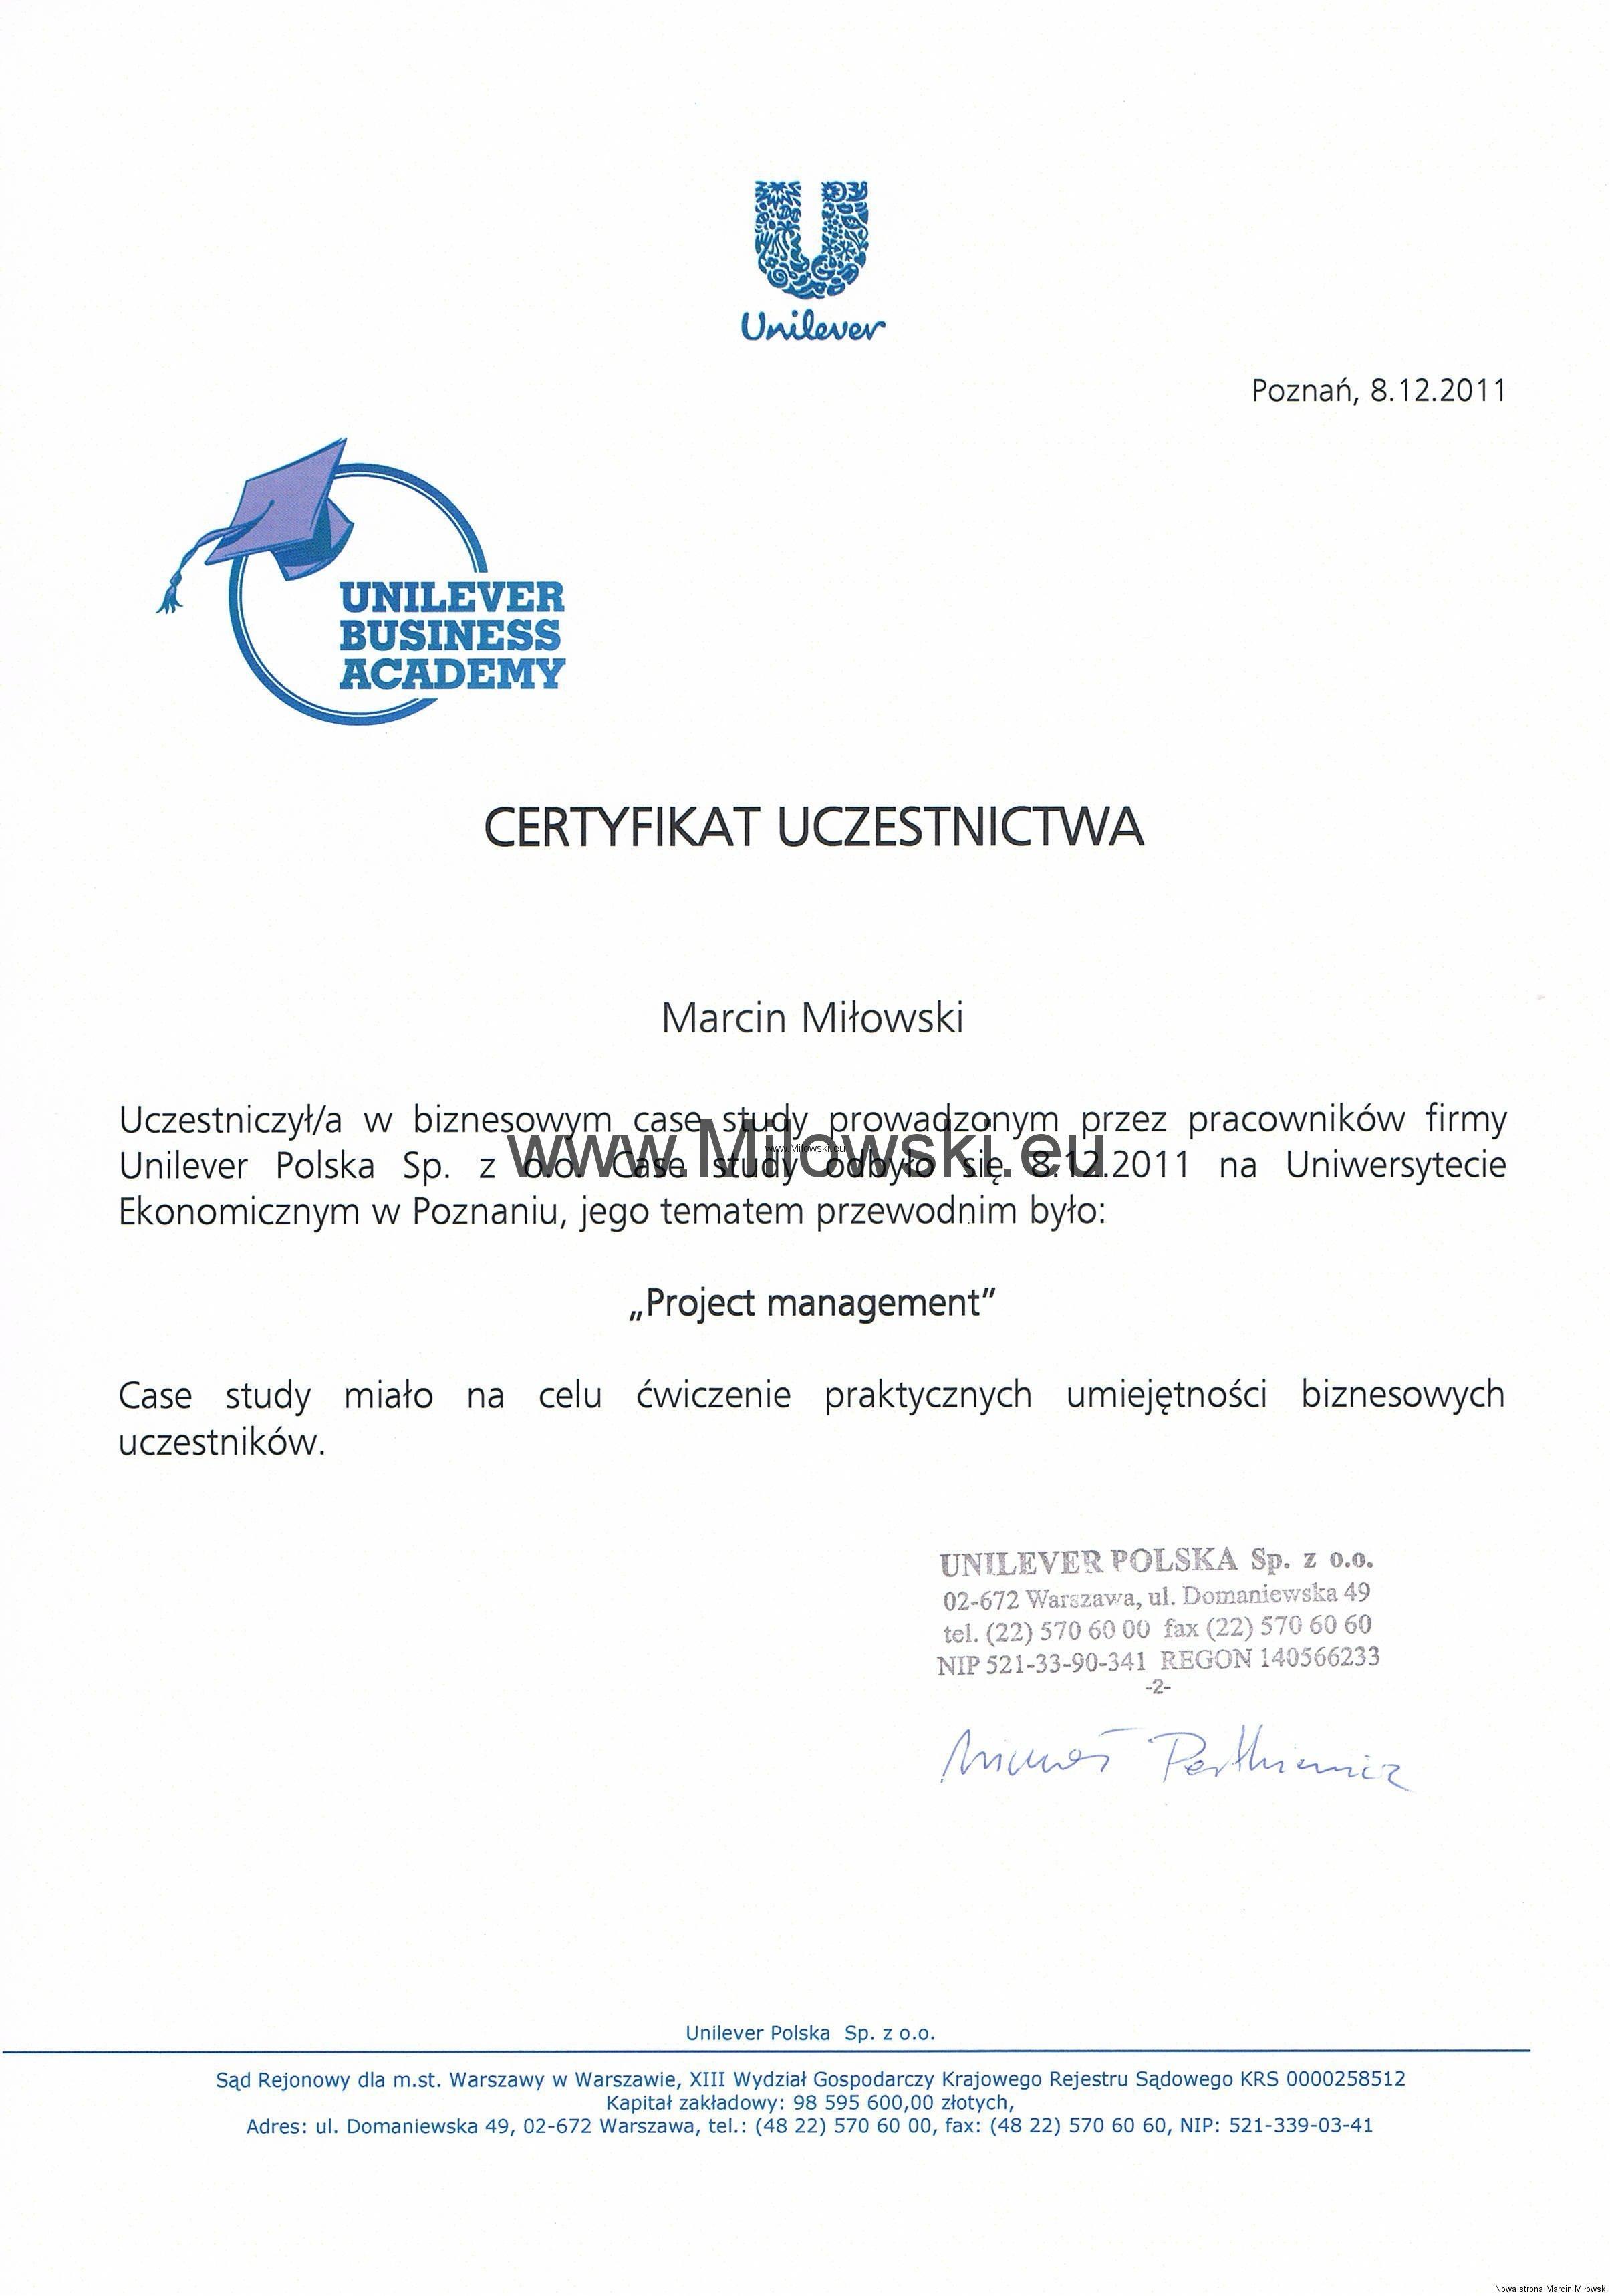 ccf20130112_00007